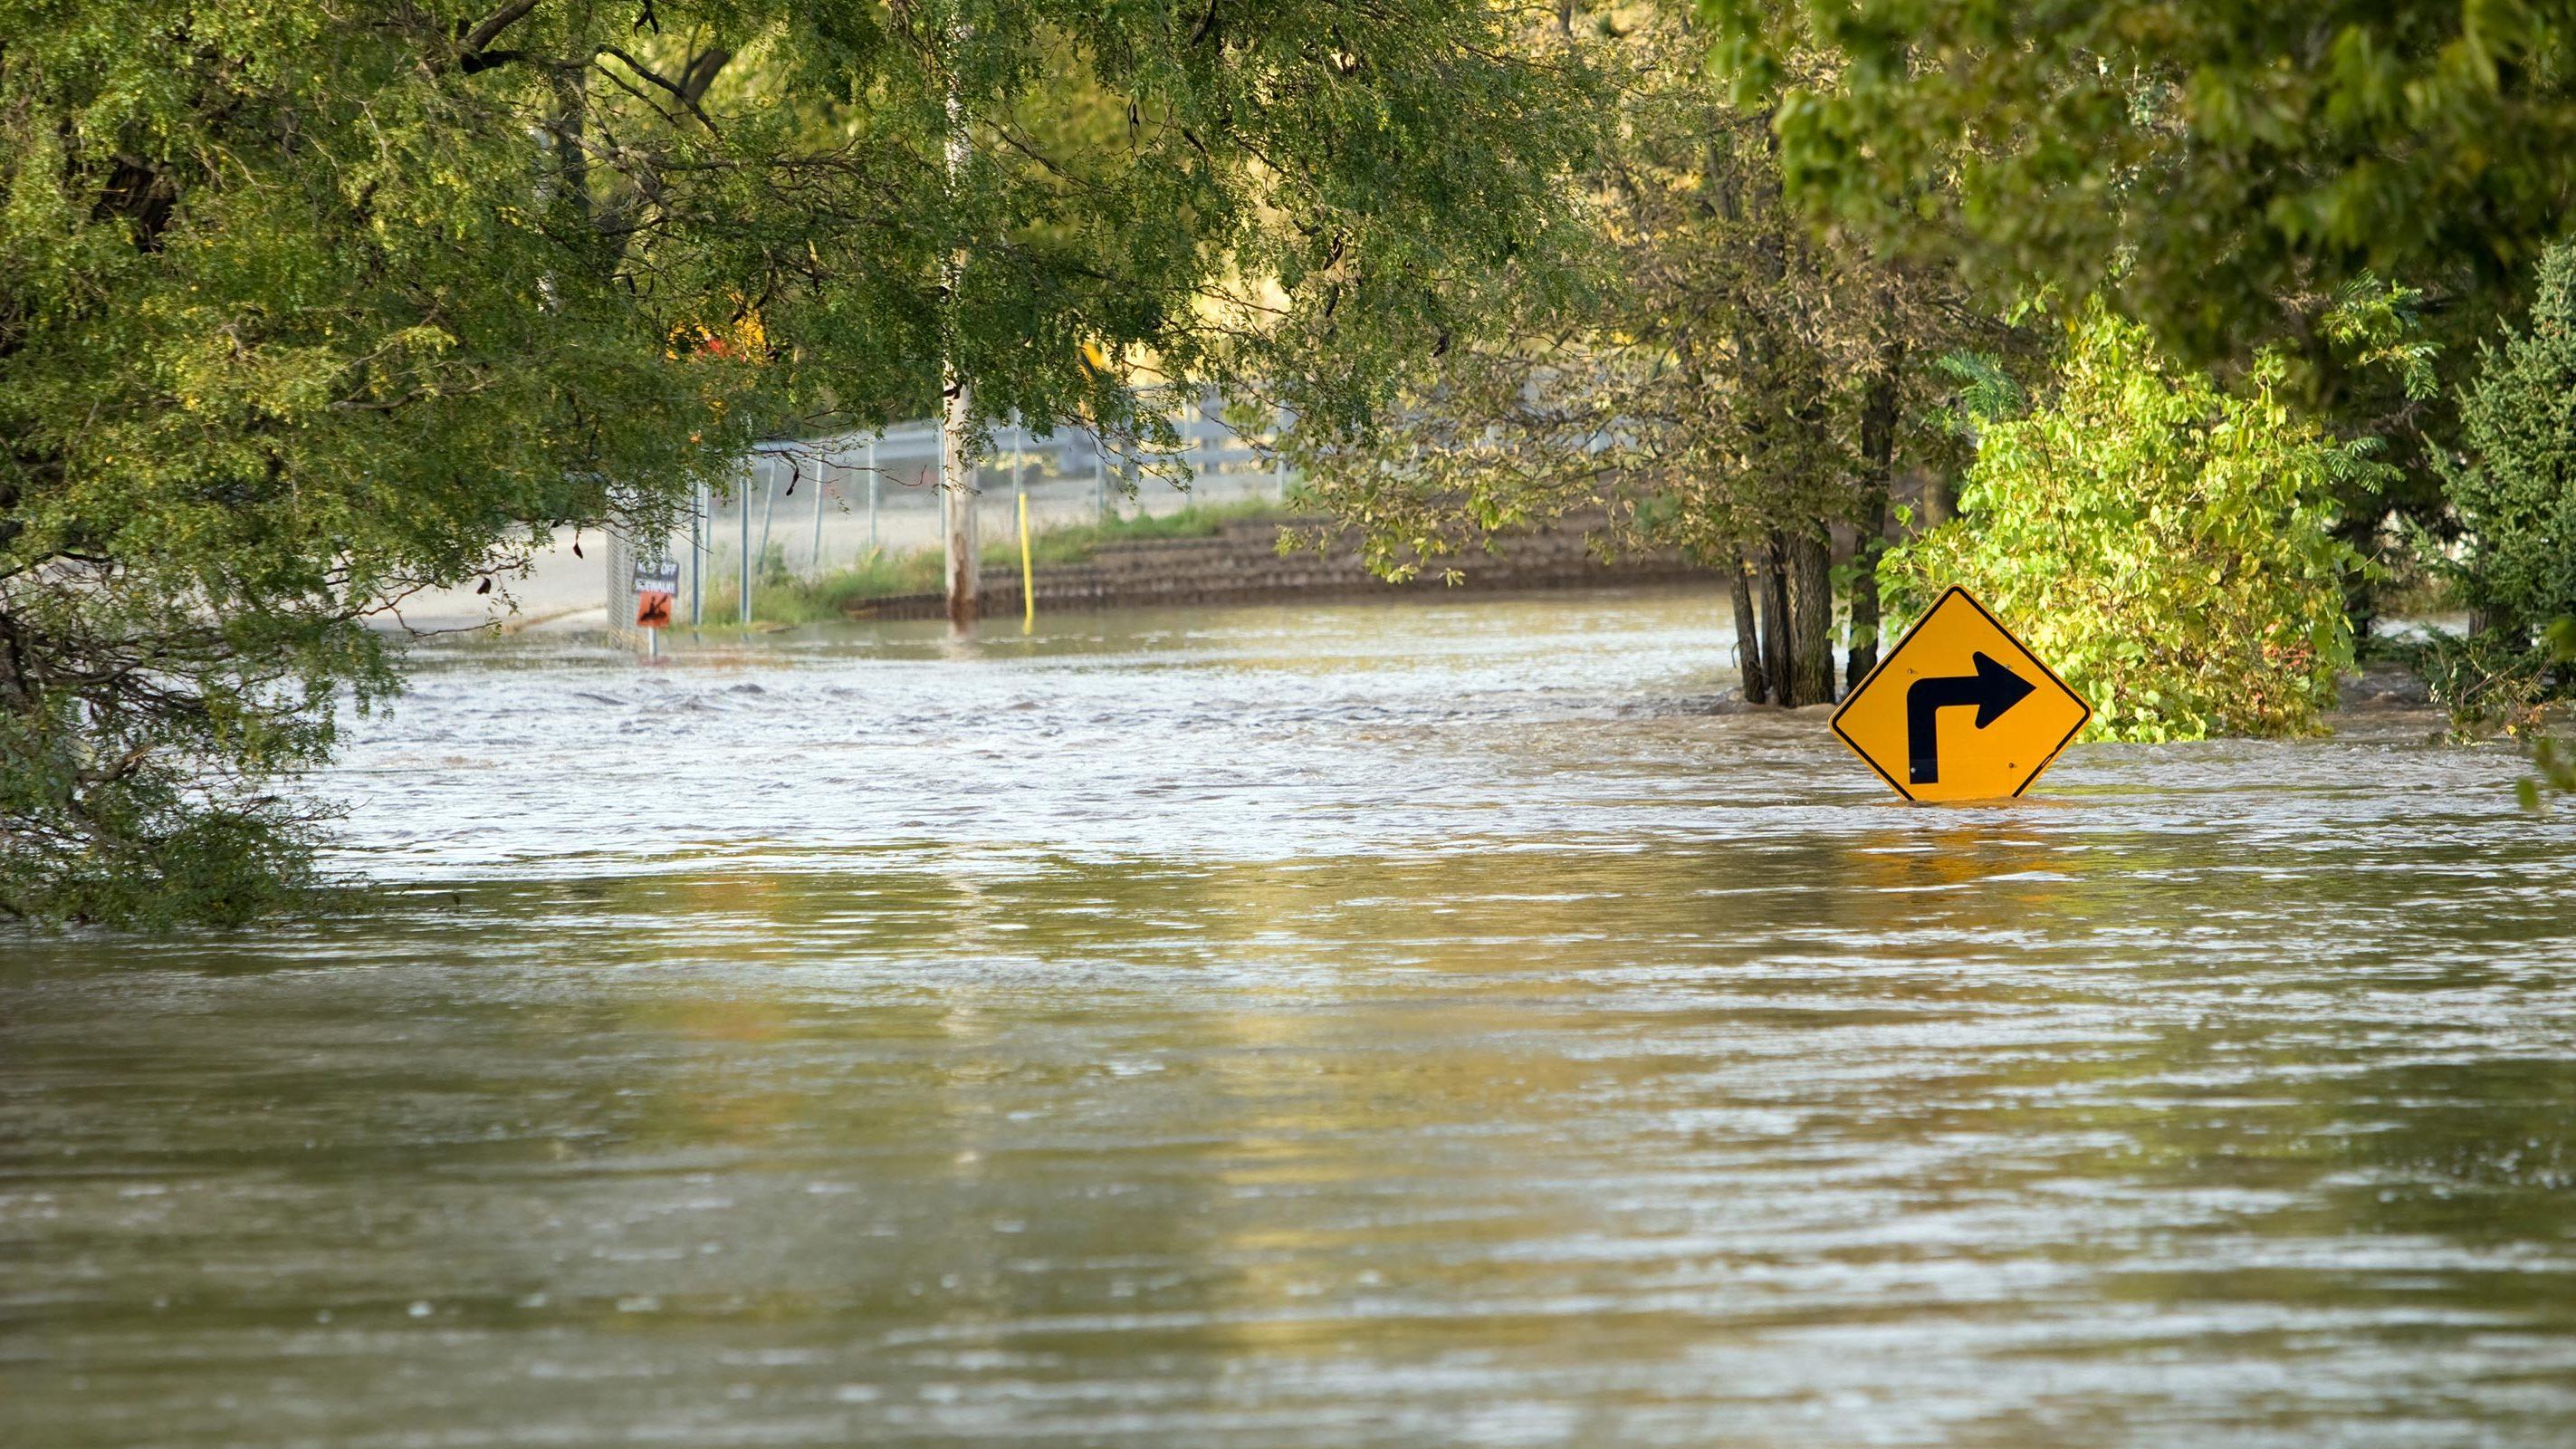 A river floods over a city street.